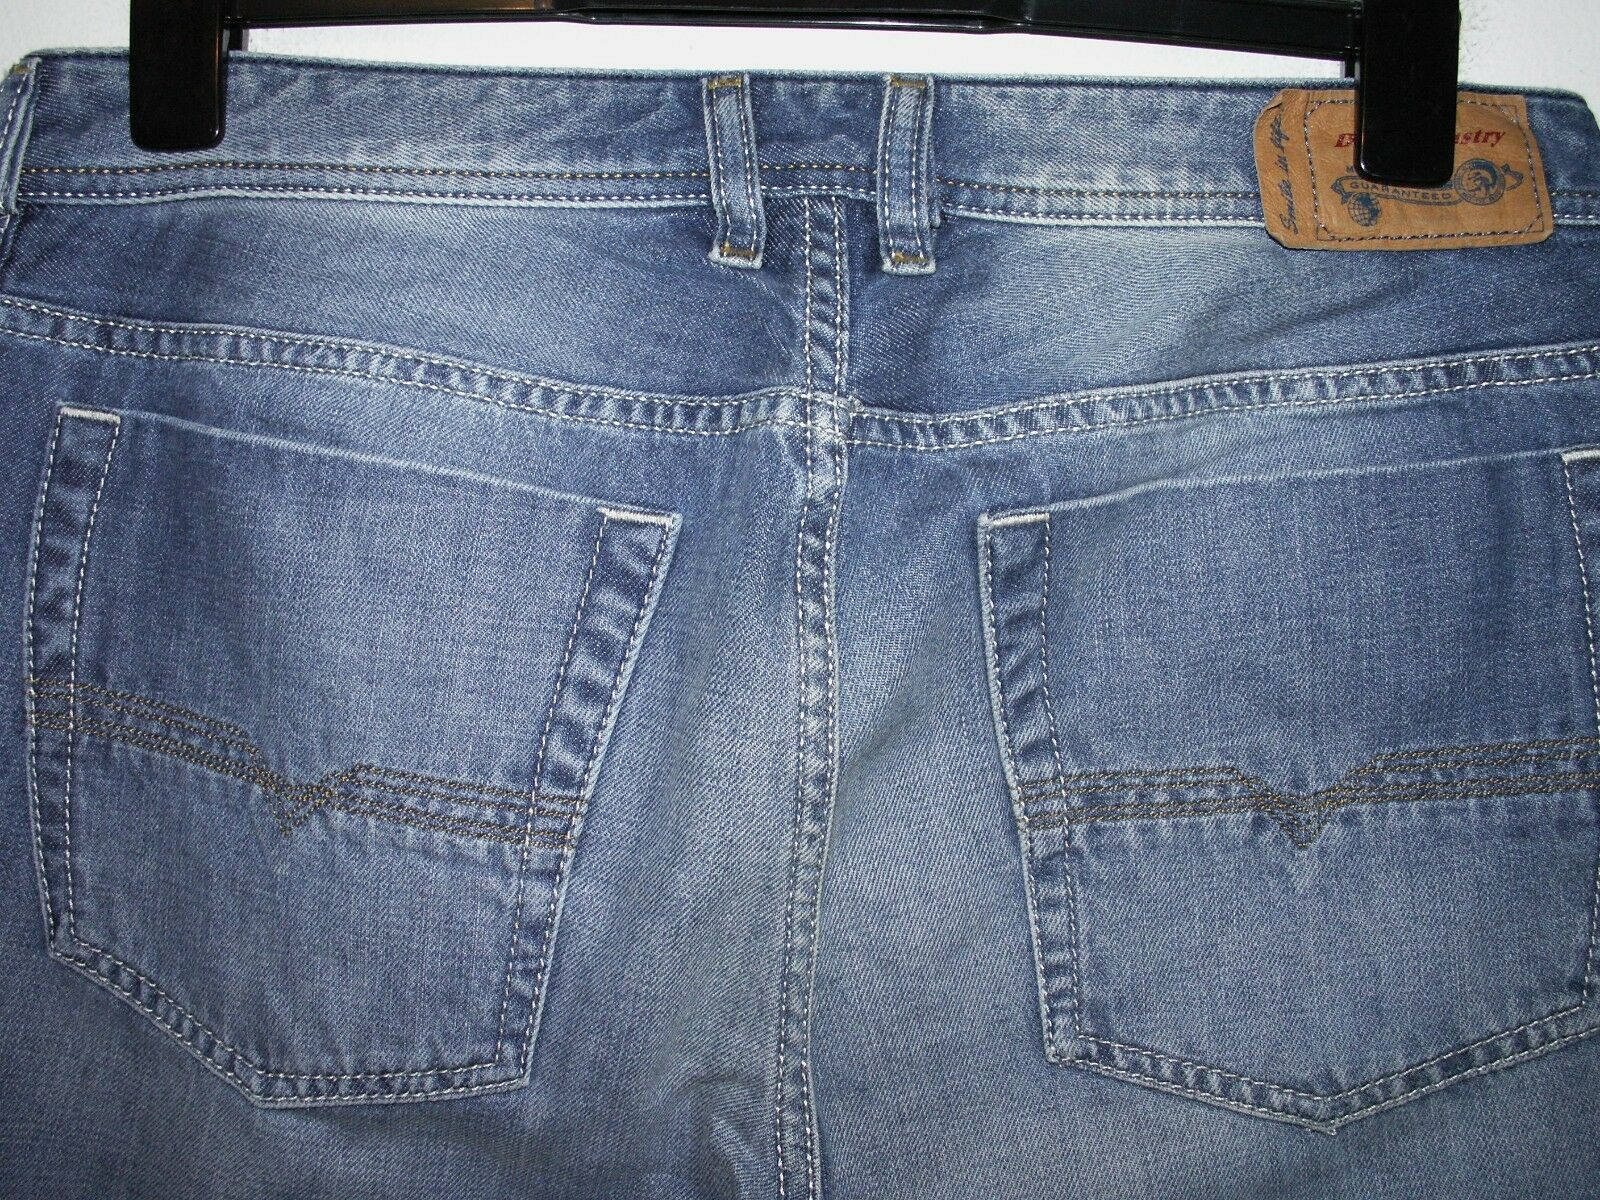 Diesel zatiny bootcut jeans wash 0839C W33 L32 (a1045) .99 sale .99